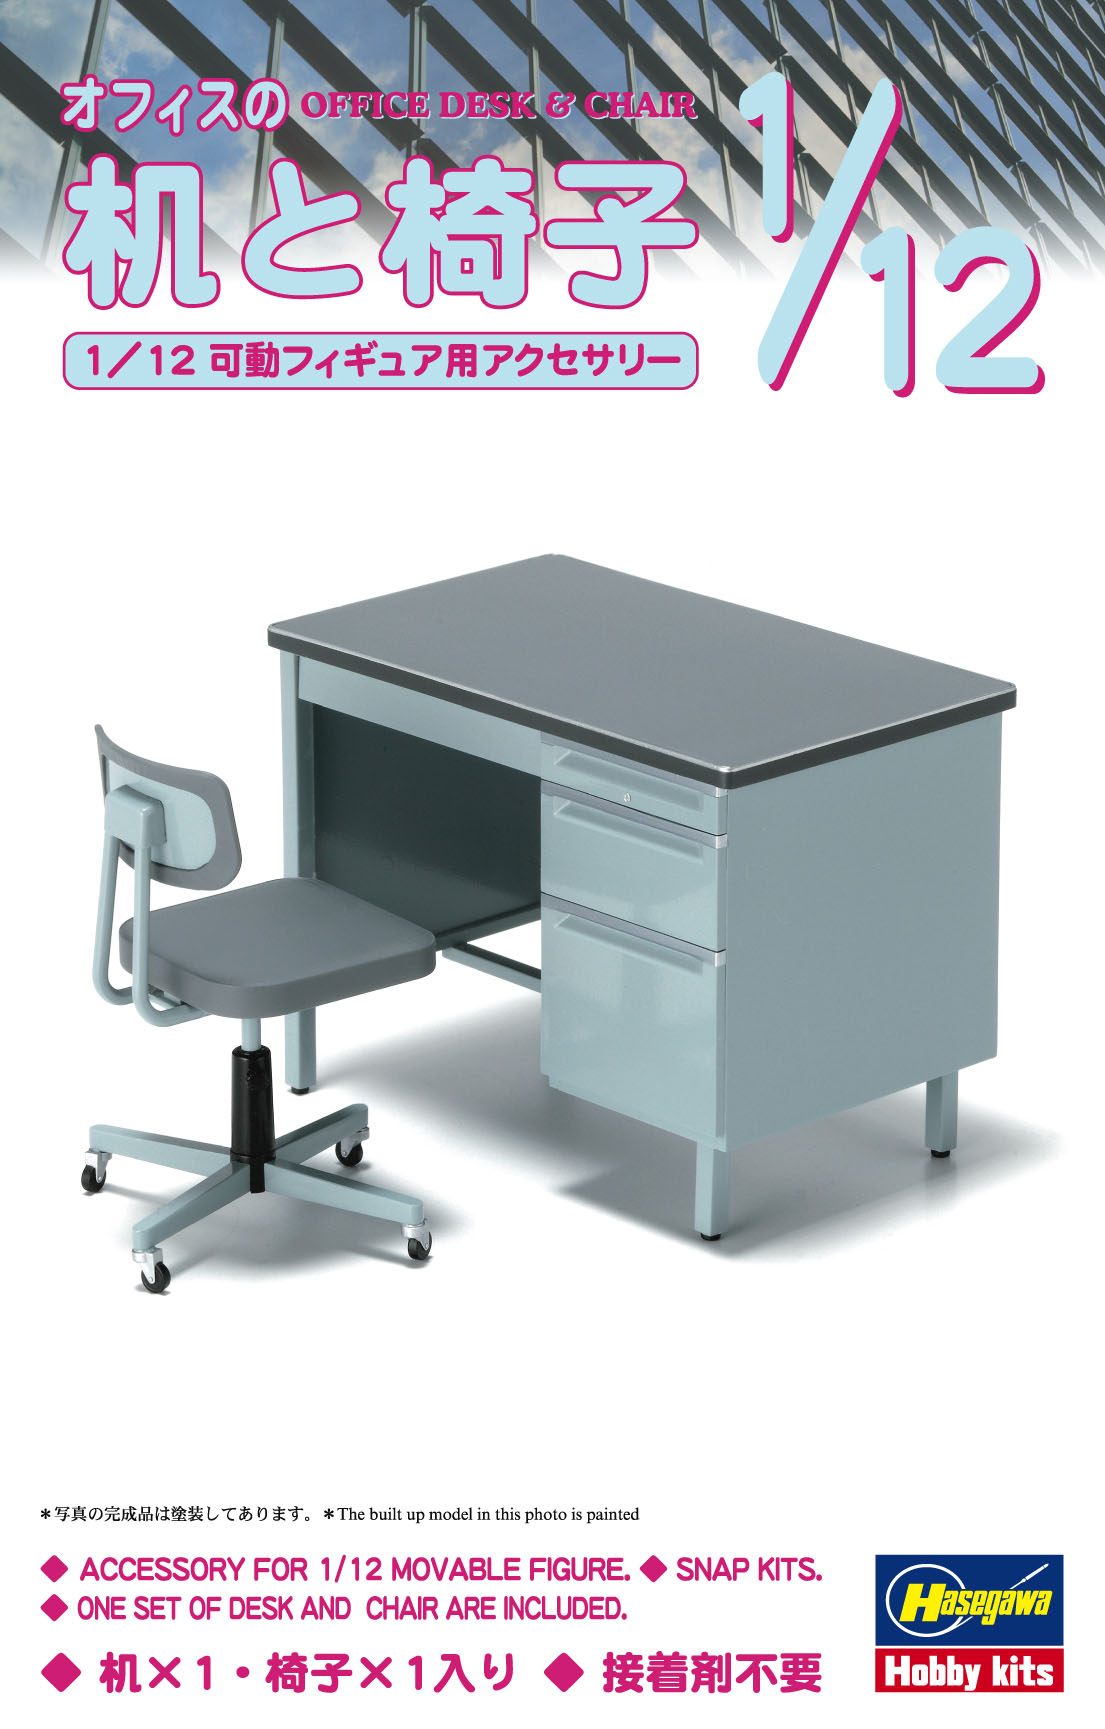 Hasegawa Office Desk & Chair